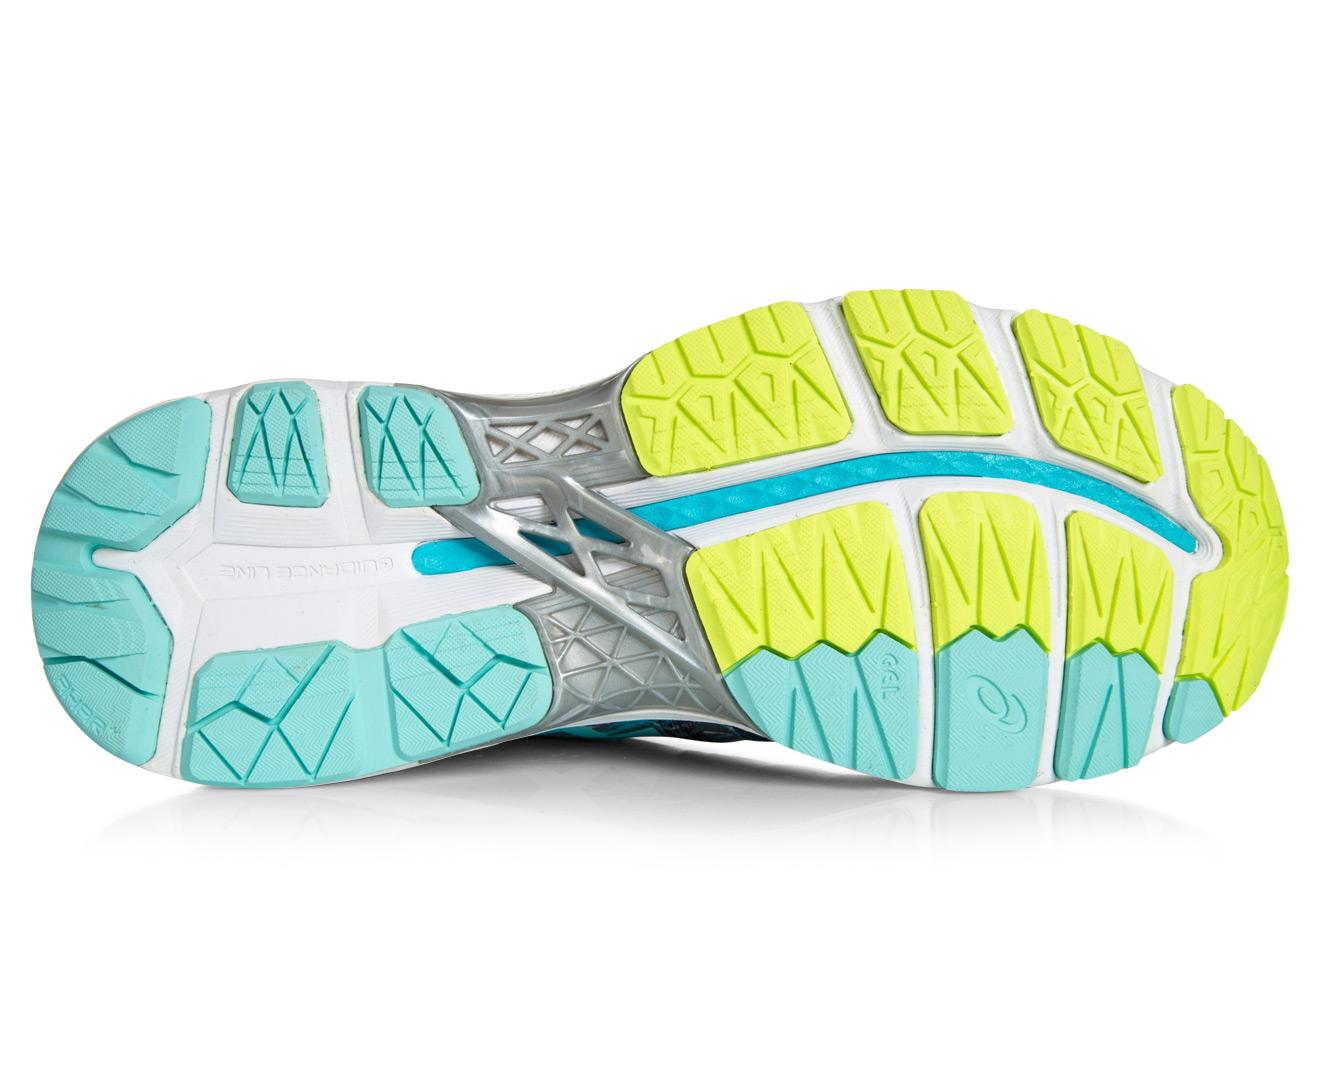 new styles bb370 3ef9d ASICS Women's GEL-Kayano 23 Shoe - Shark/Aruba Blue/Aquarium